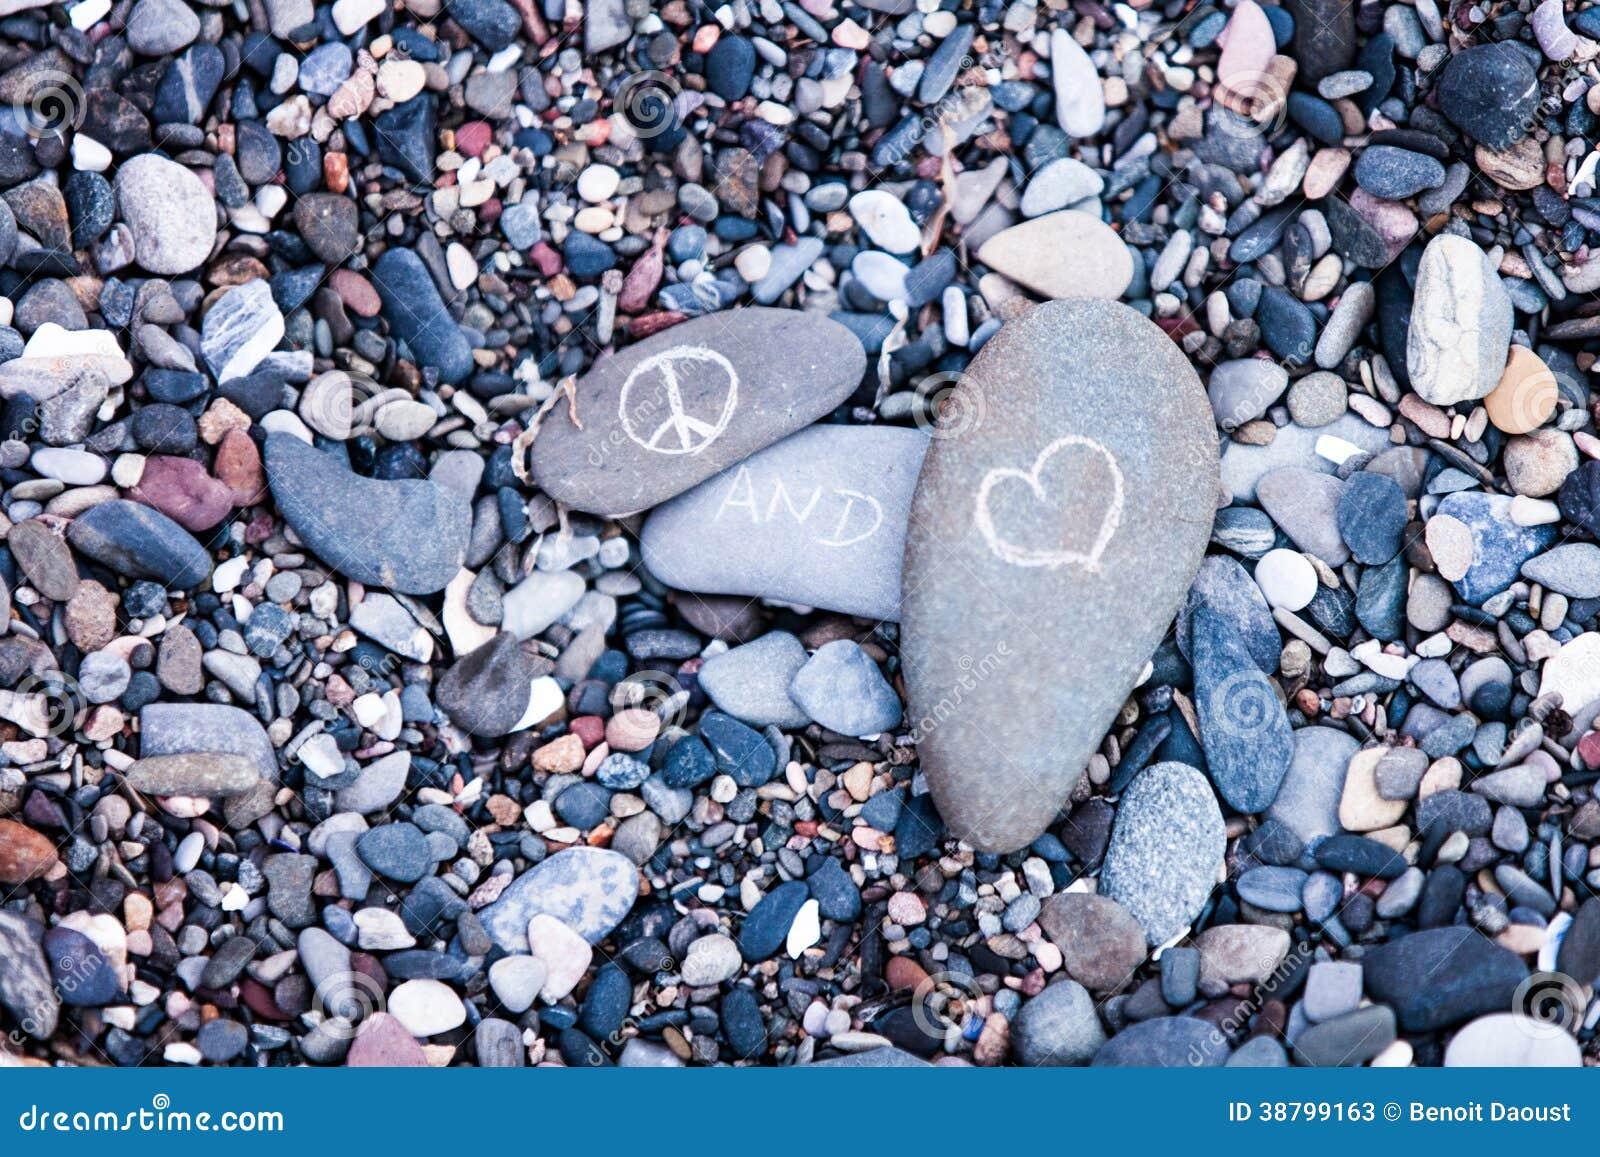 Peace and love symbols on rocks stock image image of style peace and love symbols on rocks biocorpaavc Choice Image